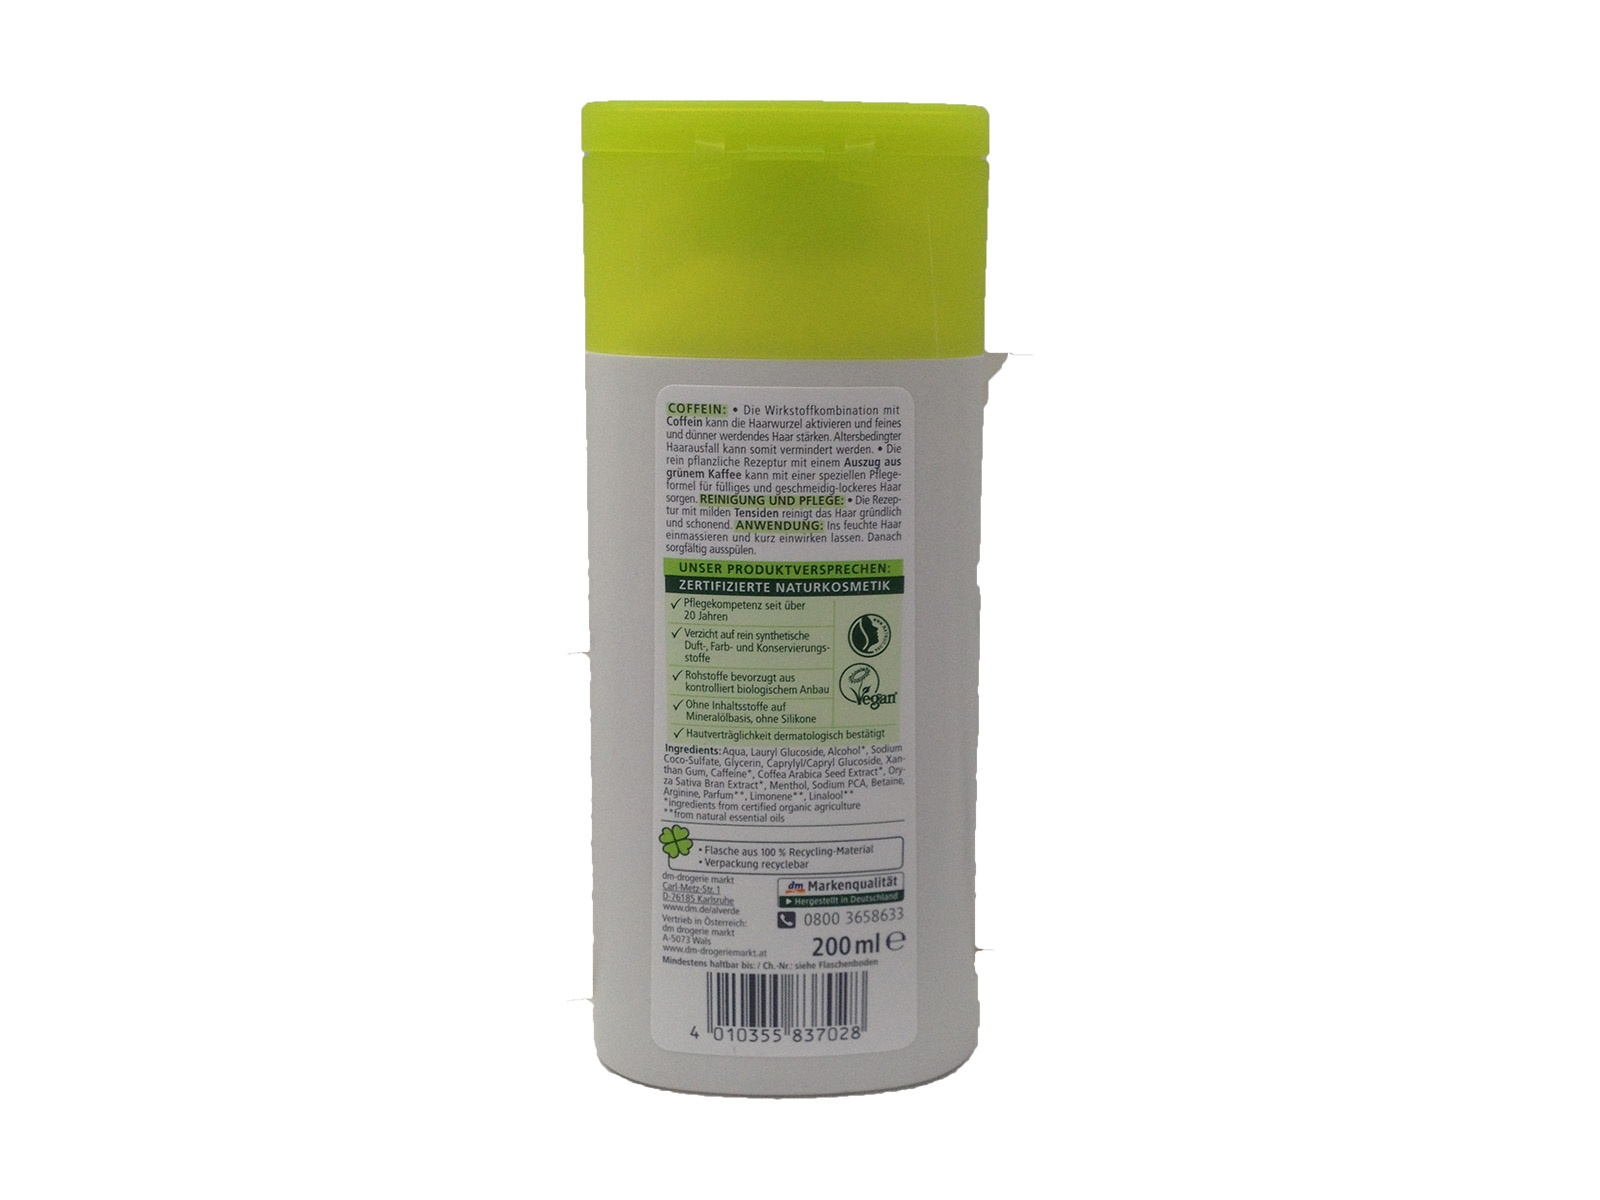 Alverde Coffein Shampoo Grüner Kaffee